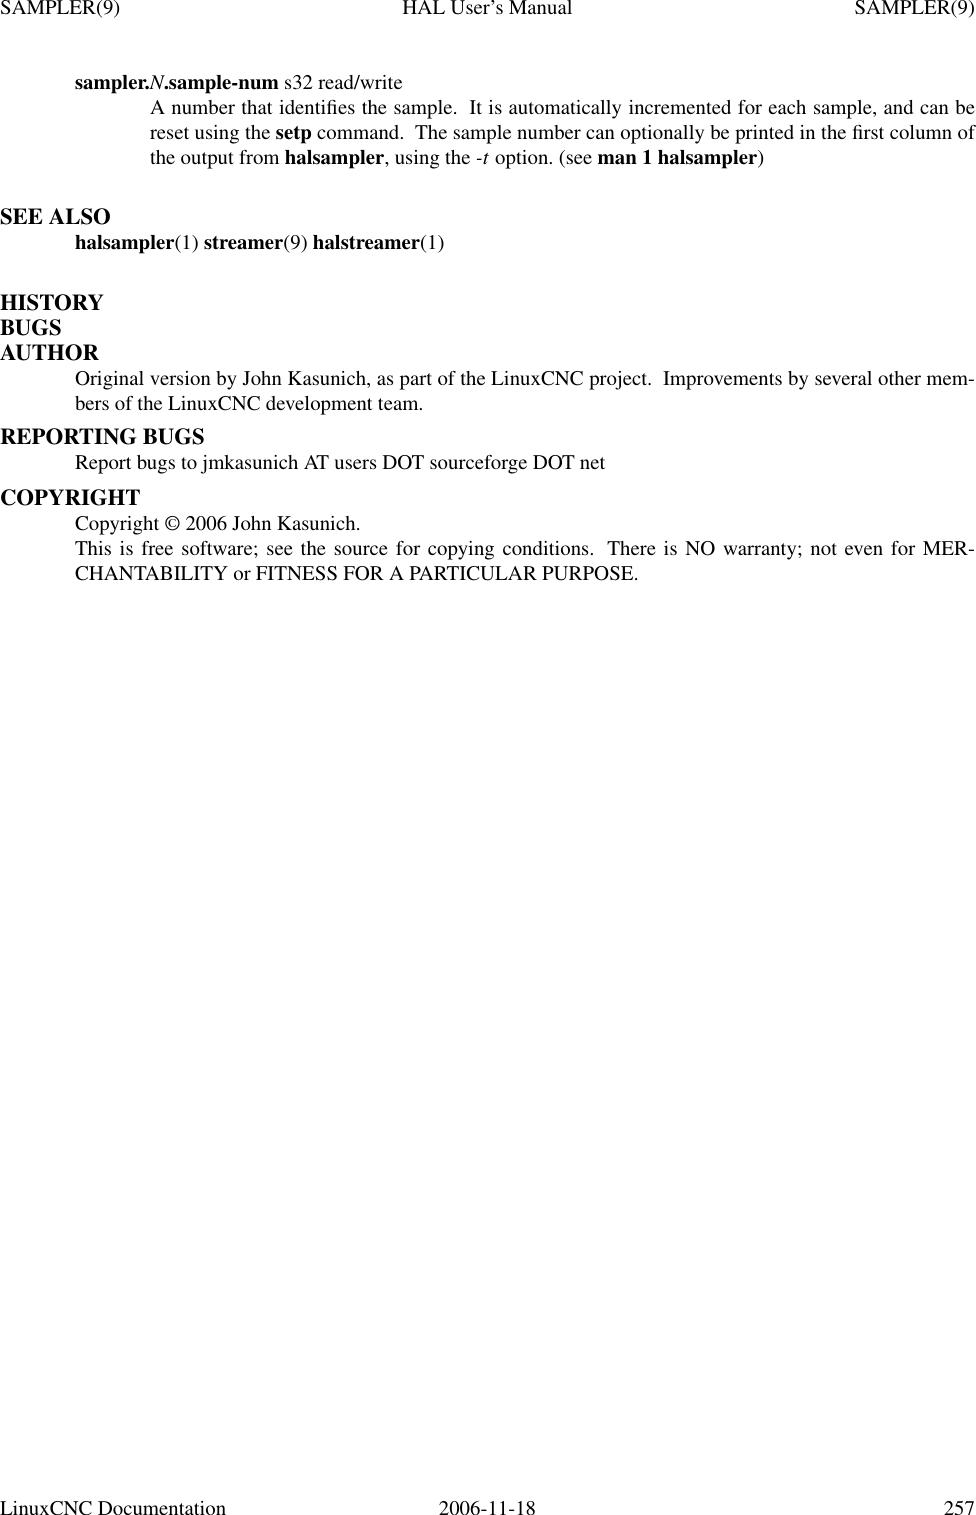 Linuxcnc Beaglebone